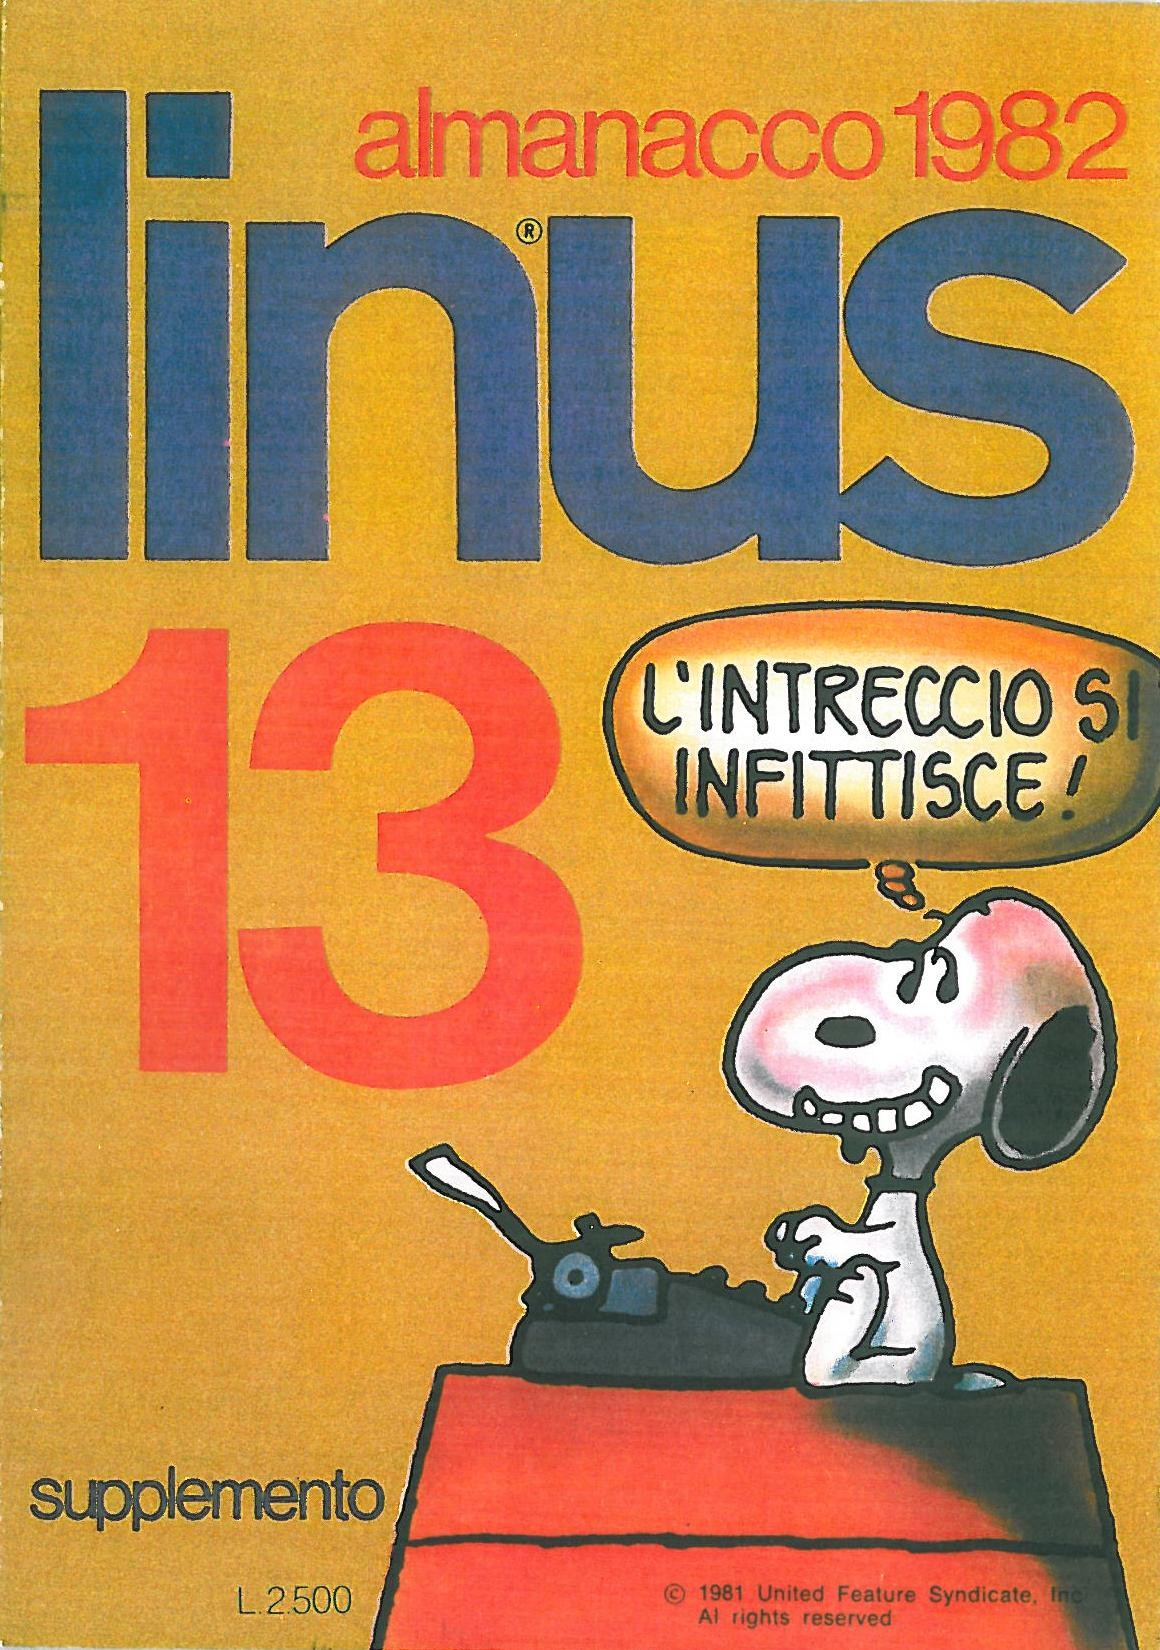 Linus 13 - Almanacco 1982